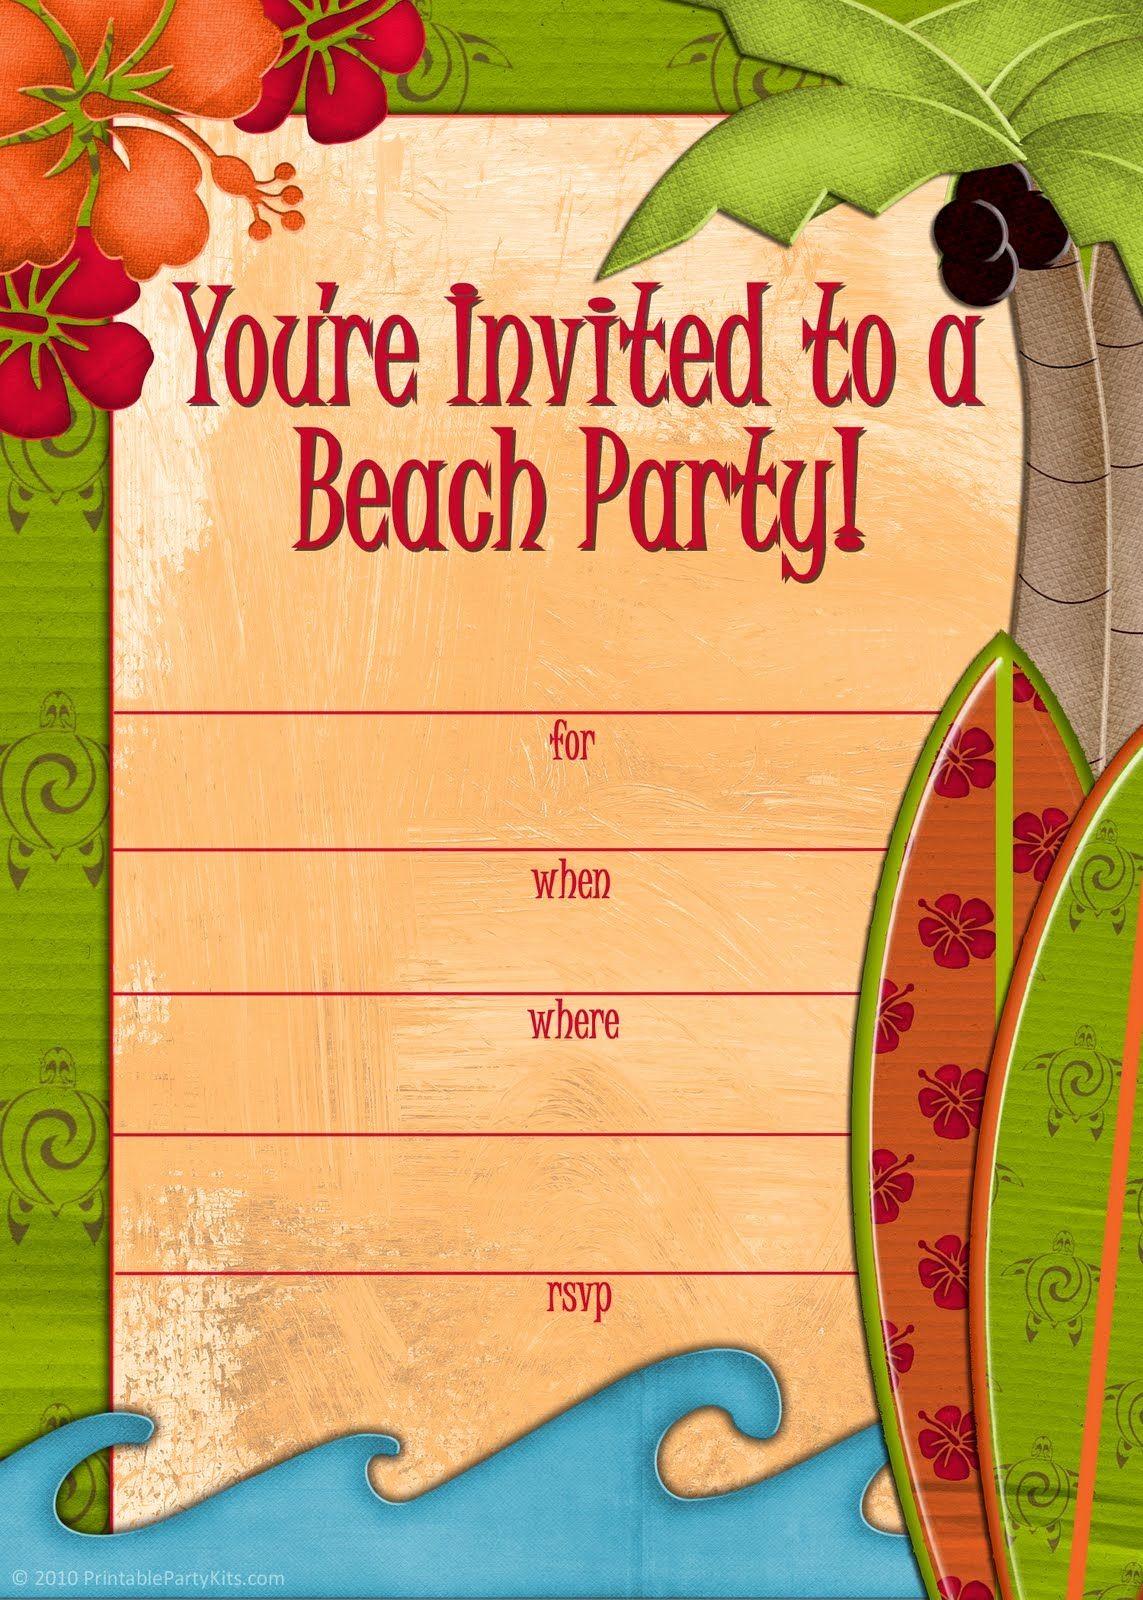 Luau Party Invitations Templates Free Unique Free Printable Beach Party Invitations From